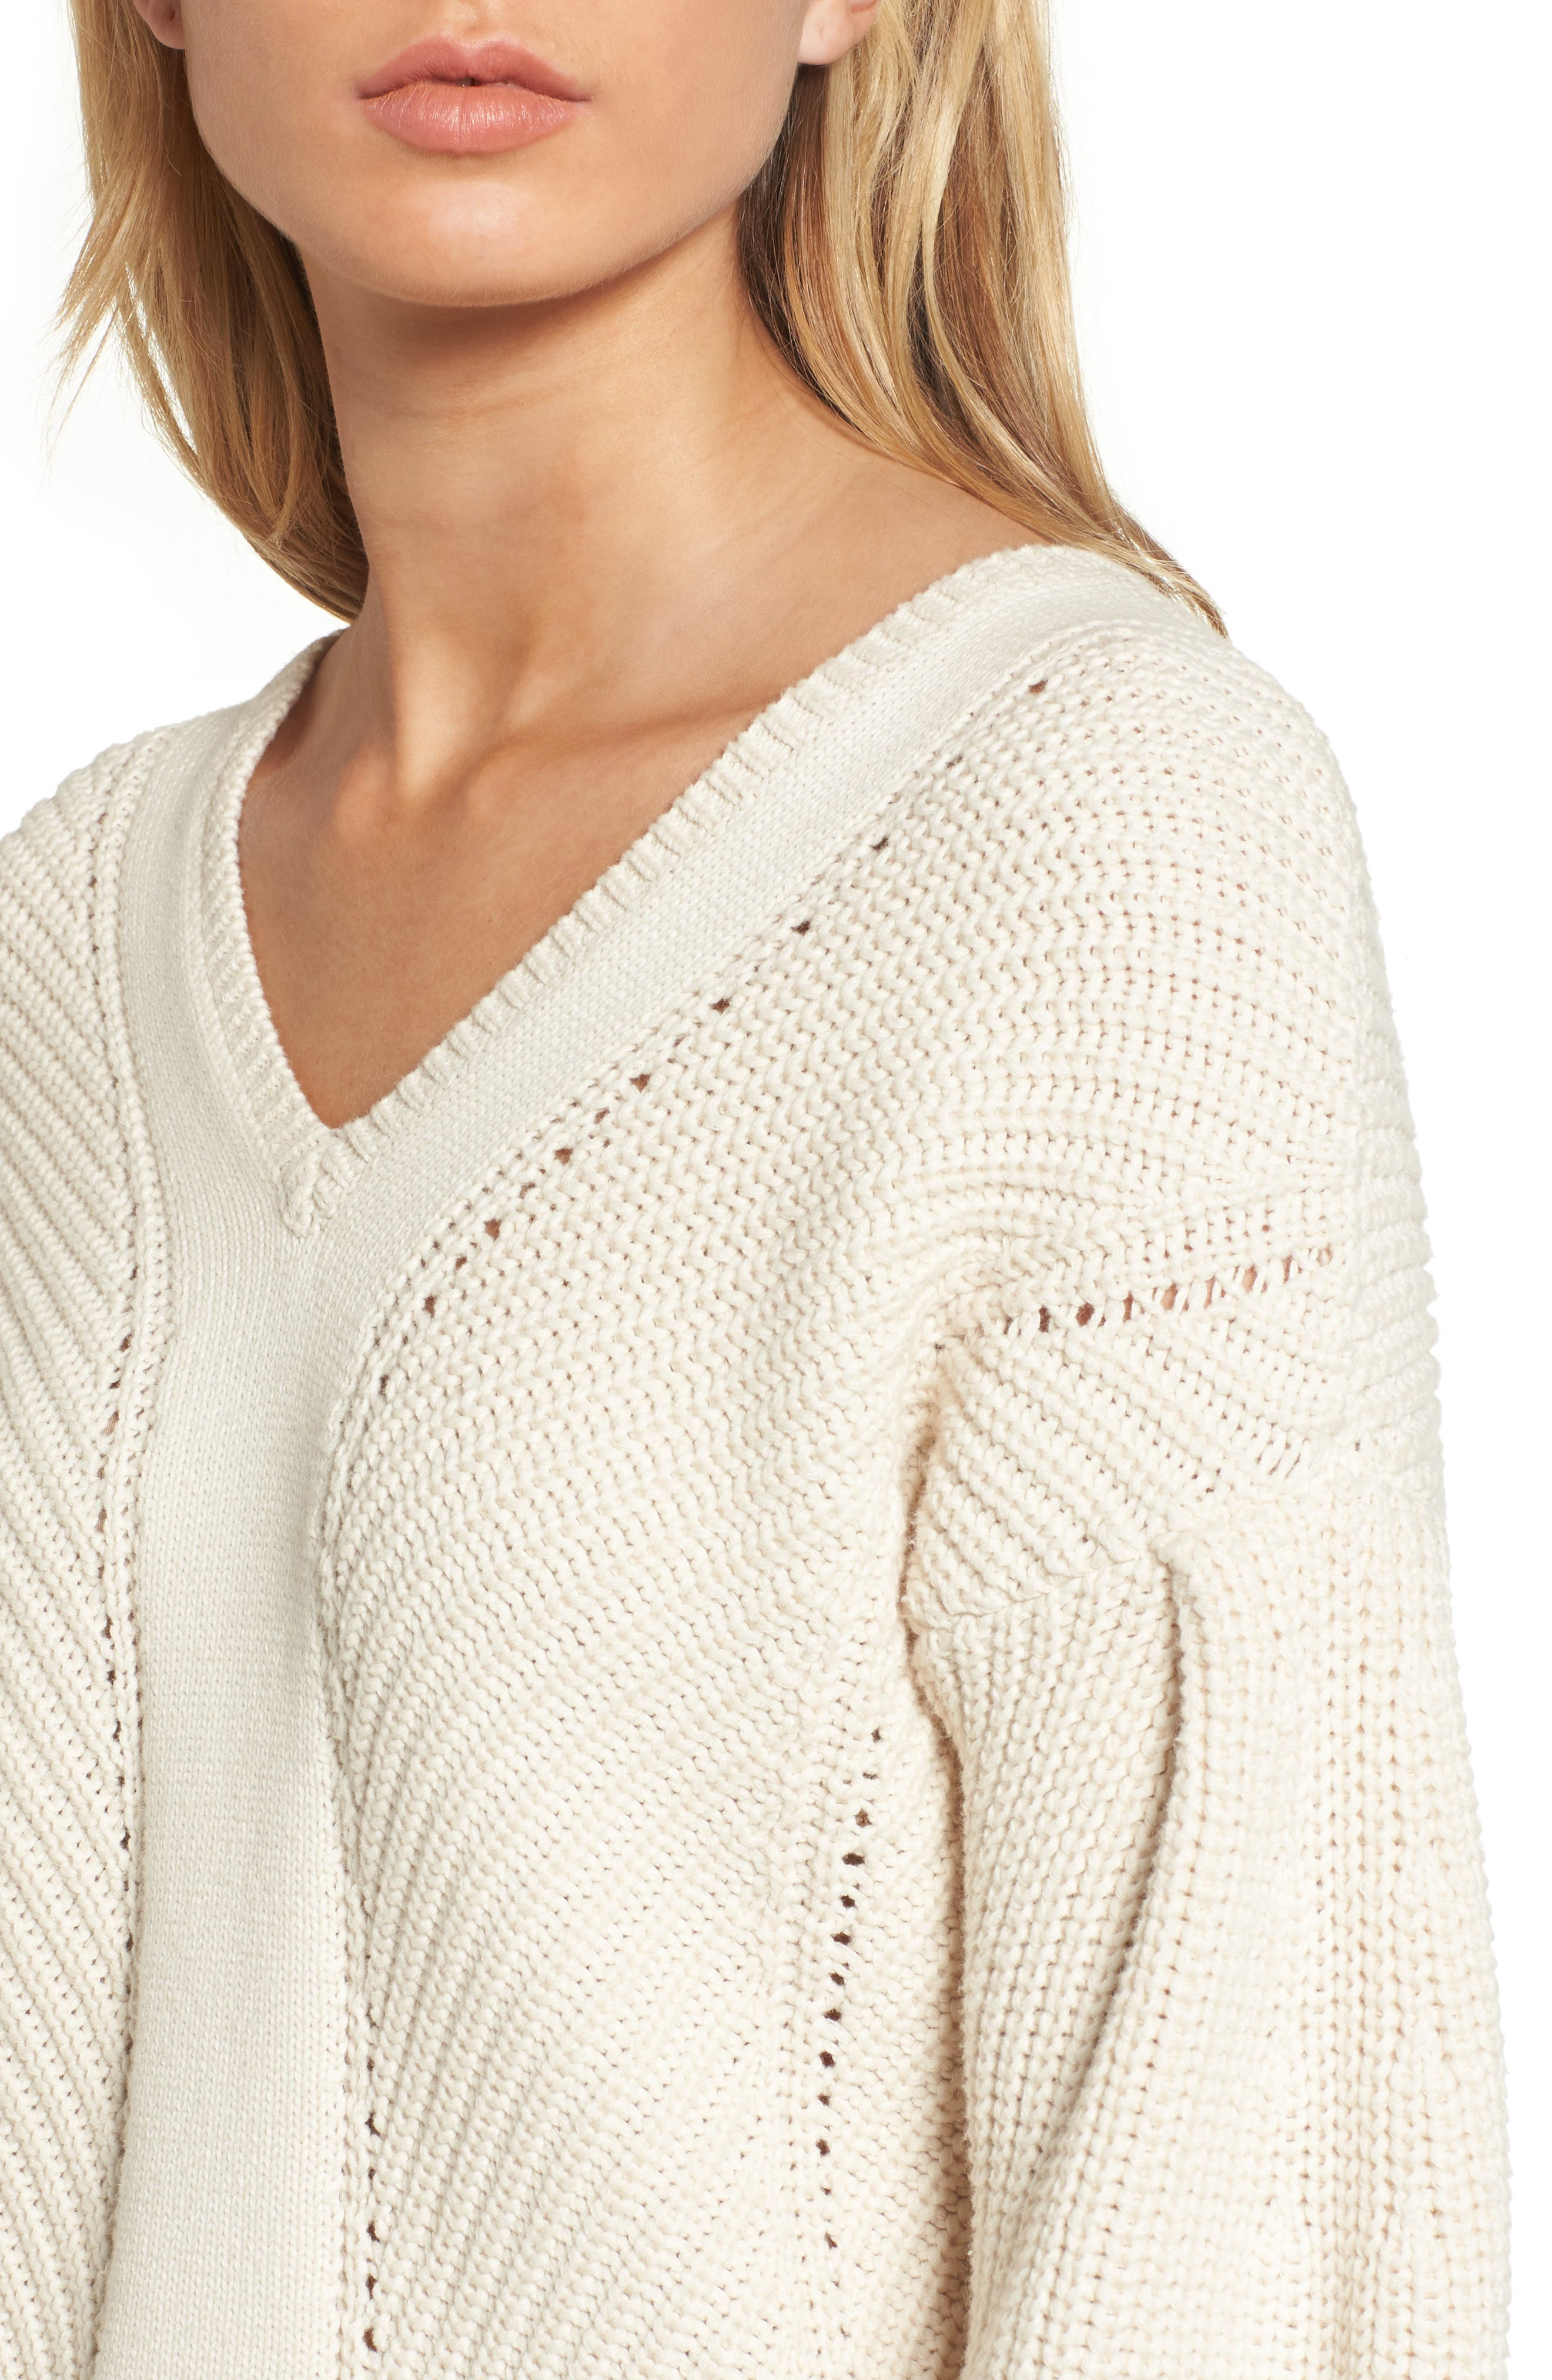 Millie Mozart Sweater,                             Alternate thumbnail 4, color,                             Classic Cream